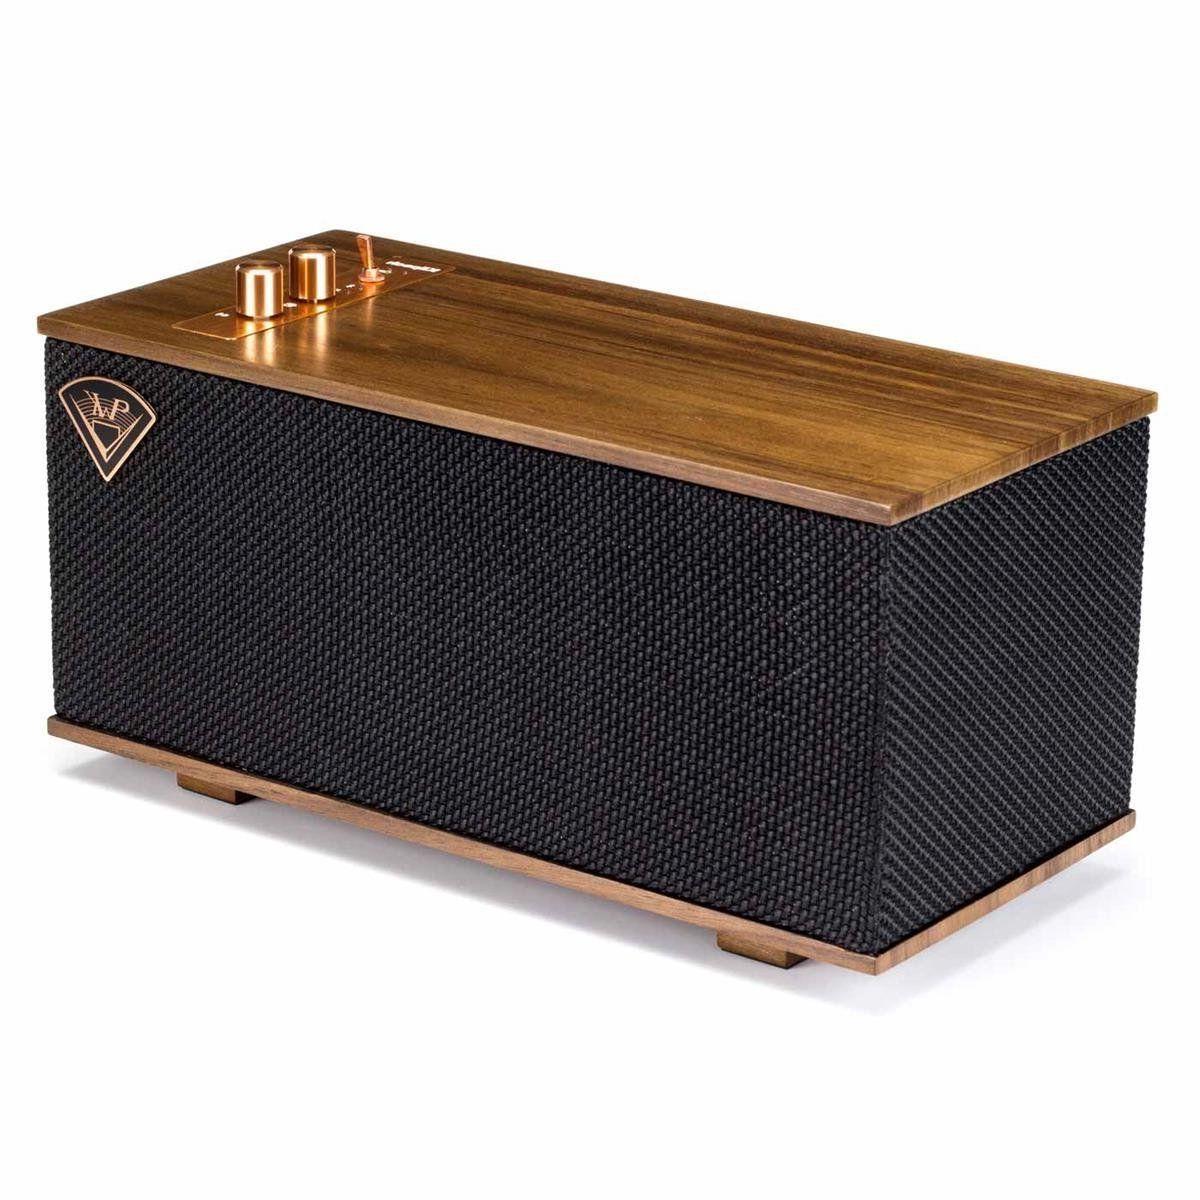 NEW Klipsch One Bluetooth Speaker Stereo